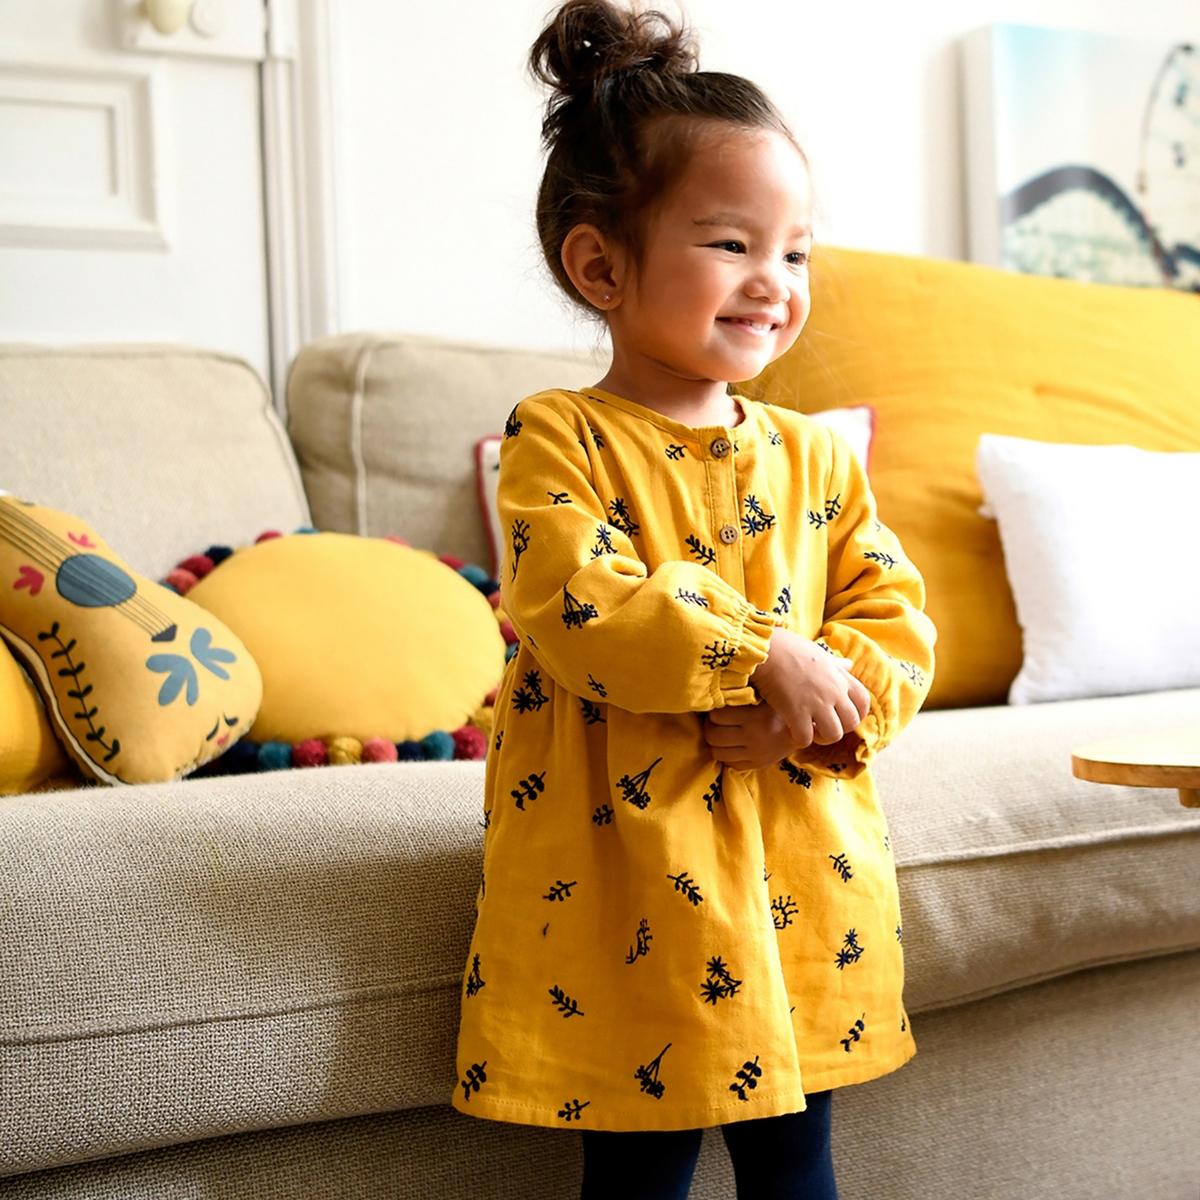 цена Комплект - платье и колготки La Redoute мес- года 3 мес. - 60 см желтый онлайн в 2017 году